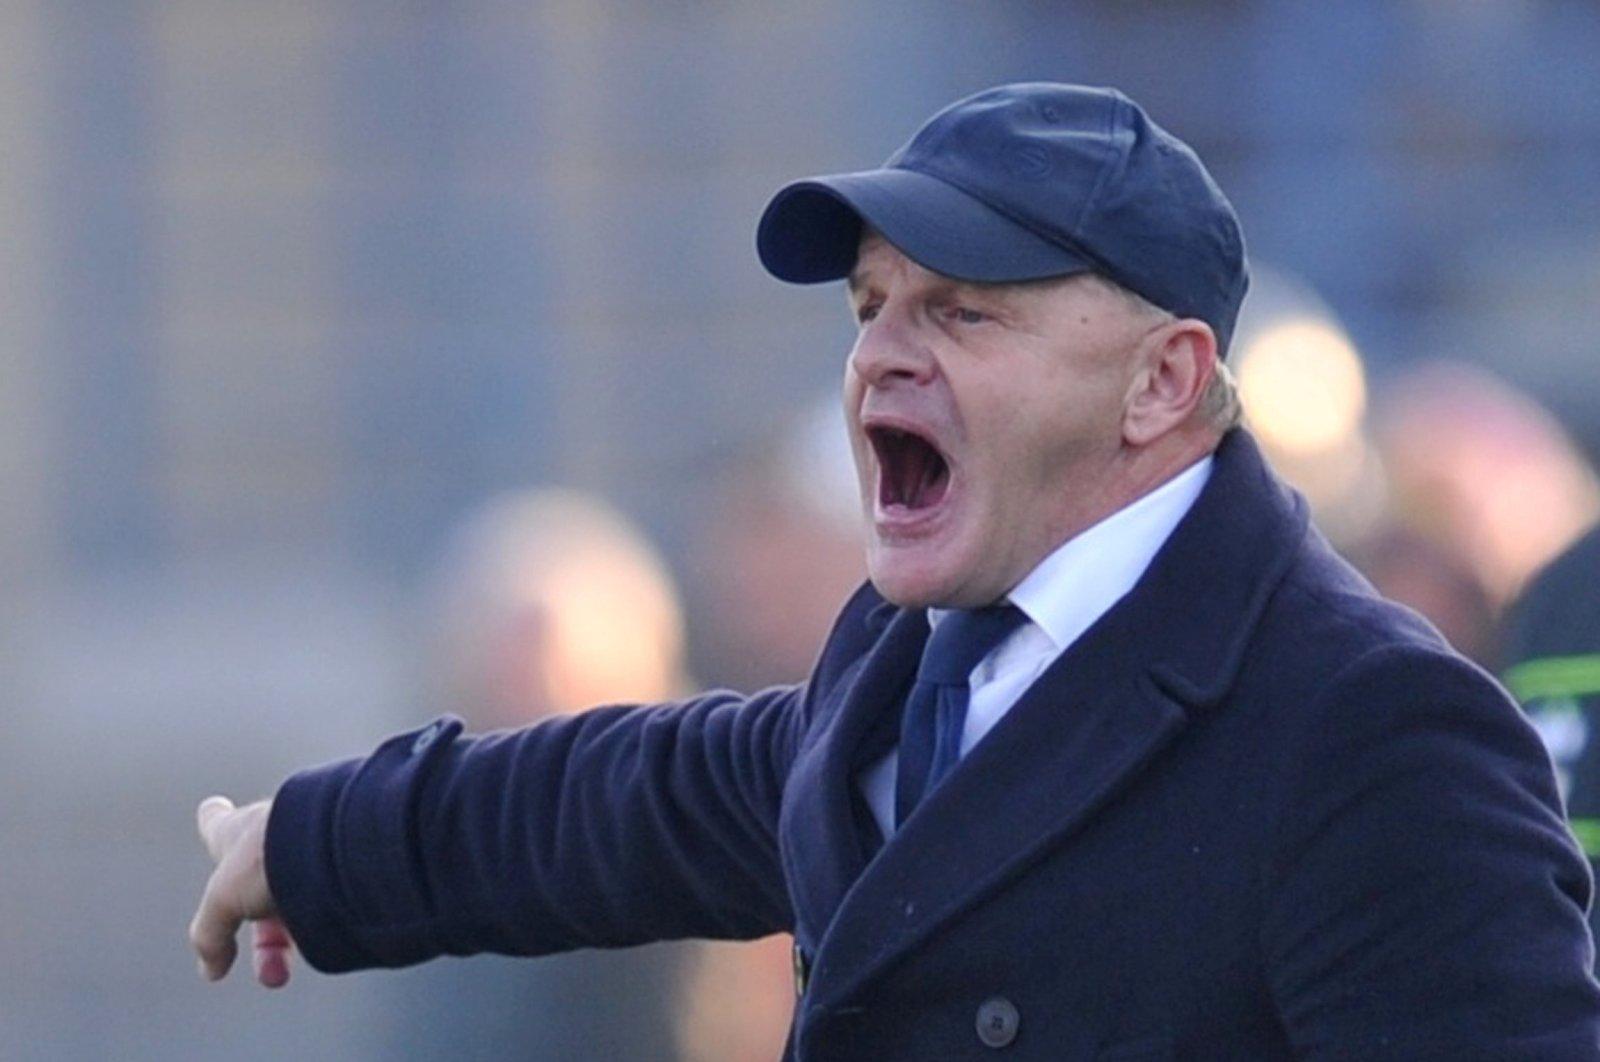 Then-Empoli coach Giuseppe Iachini reacts during a Serie A match against Inter Milan, Stadio Carlo Castellani, Empoli, Italy, Dec. 29, 2018. (Reuters Photo)